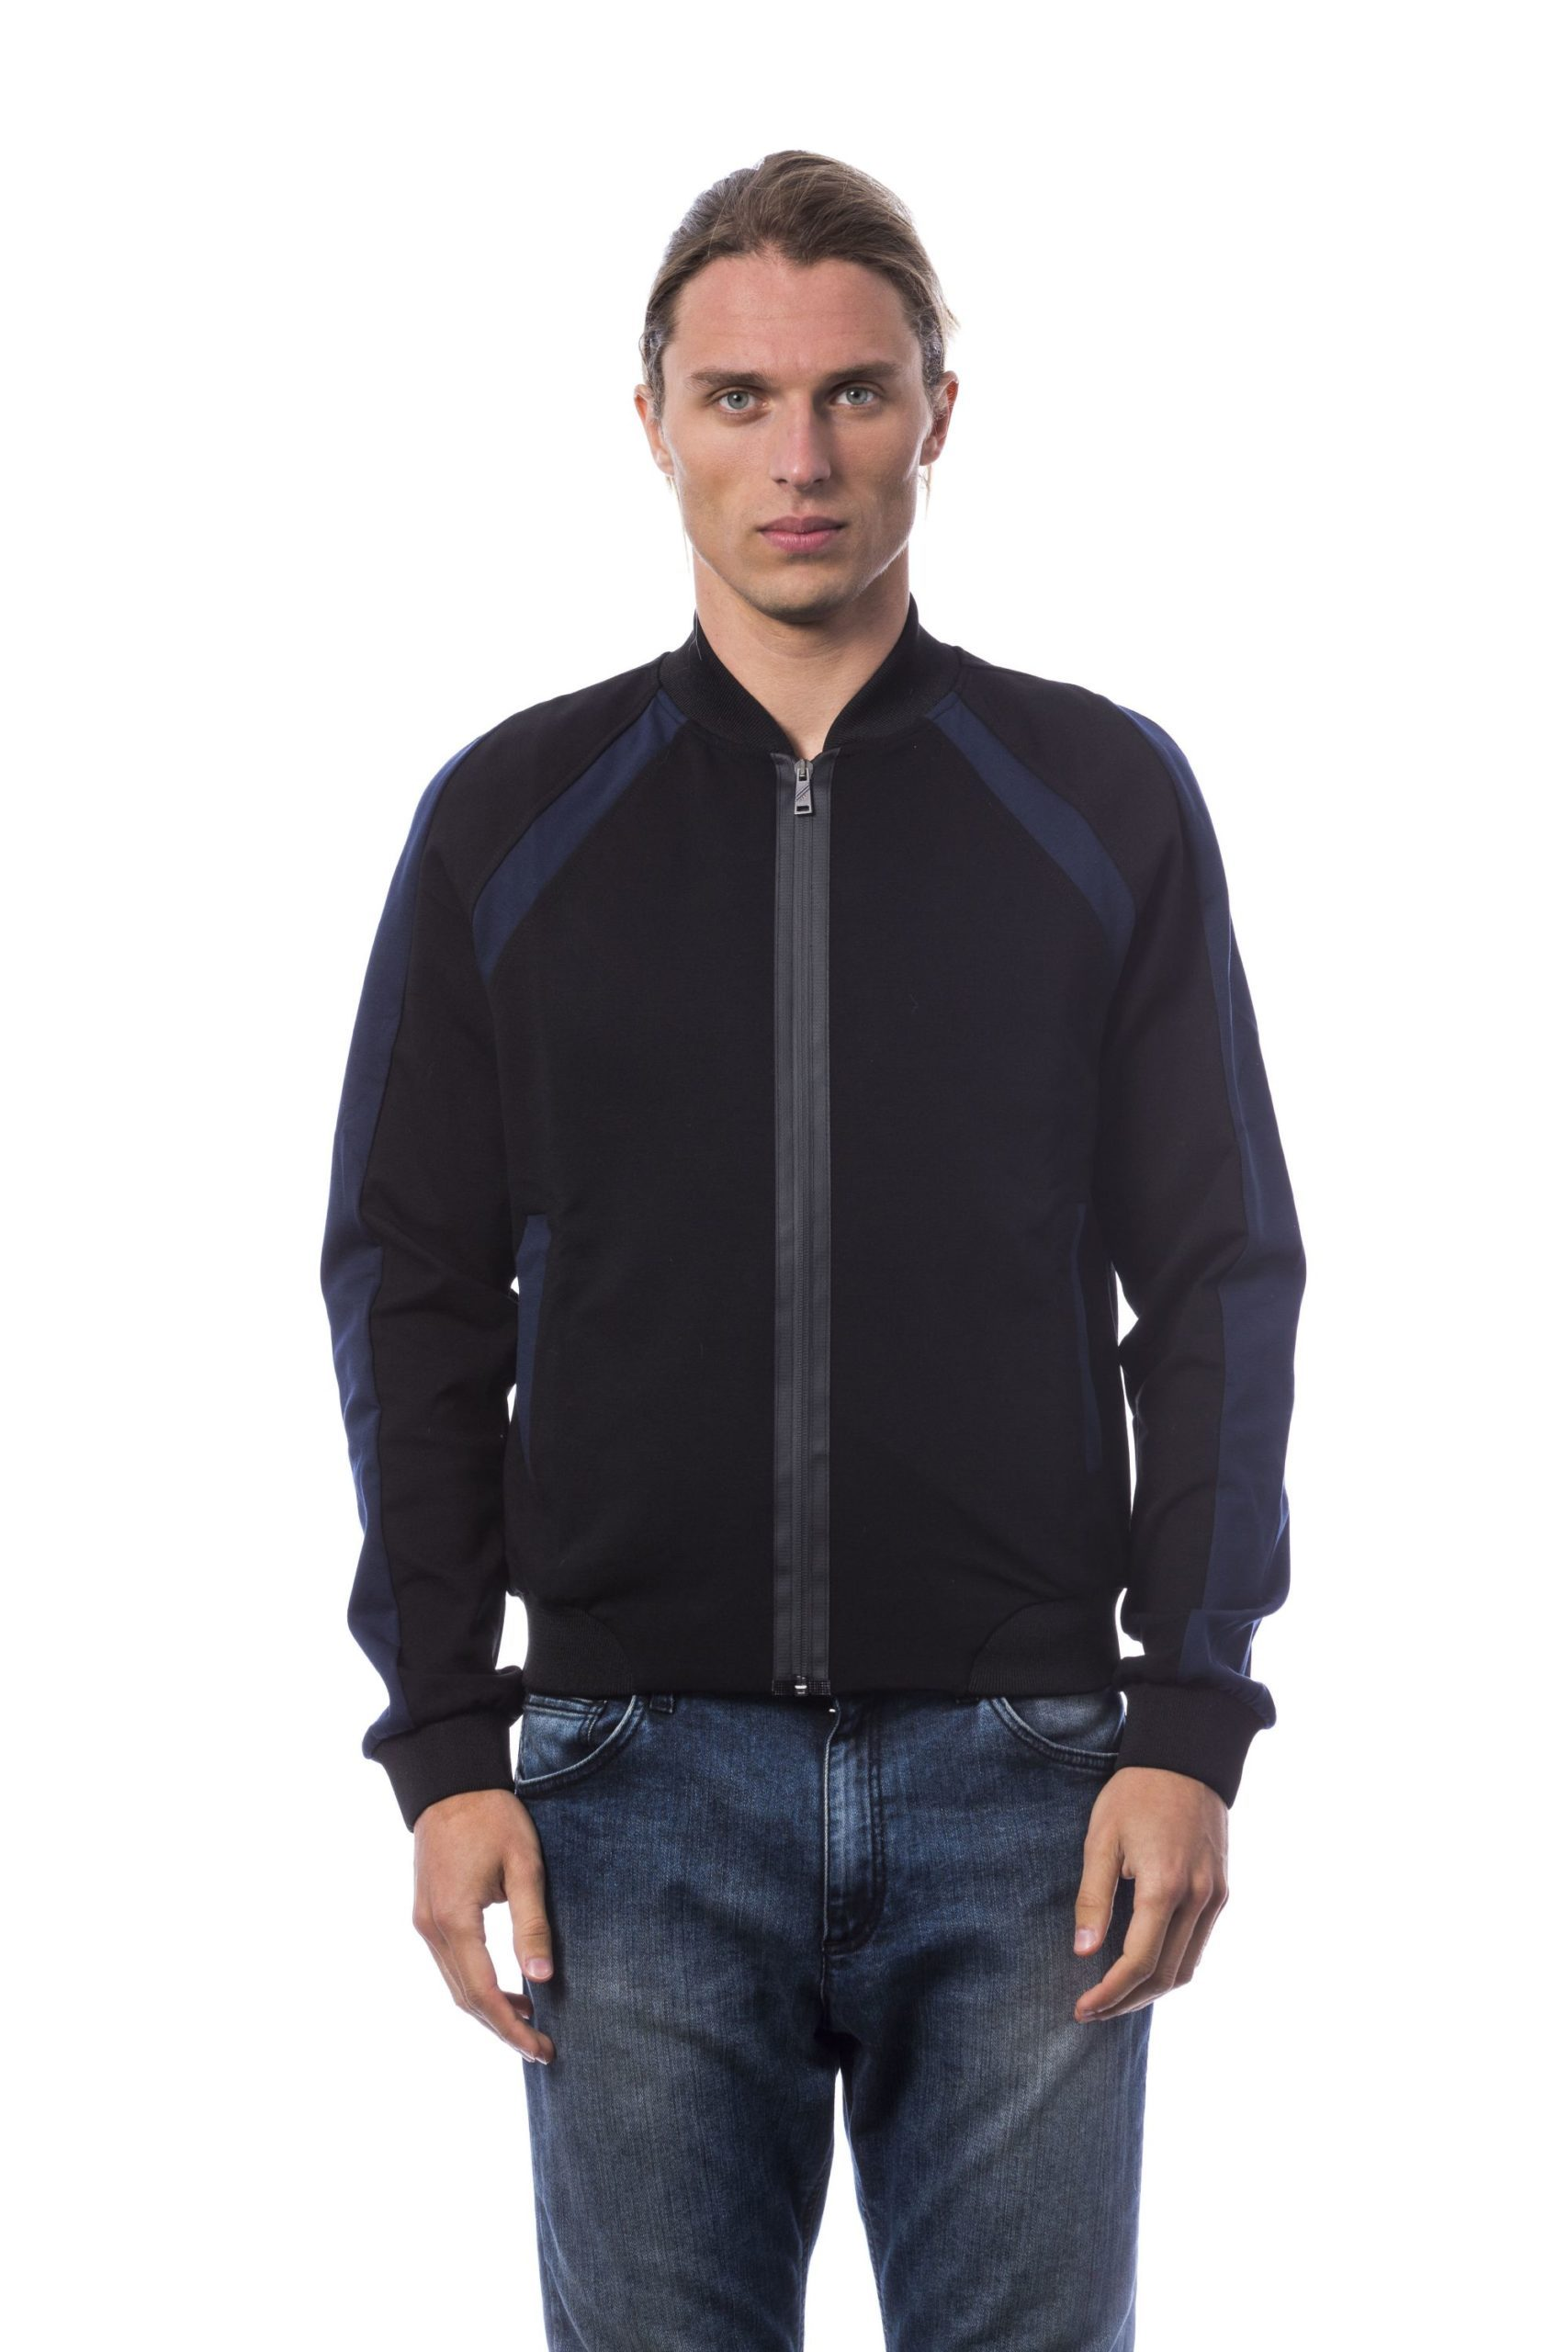 Verri Men's Sweater Black VE1272867 - XL